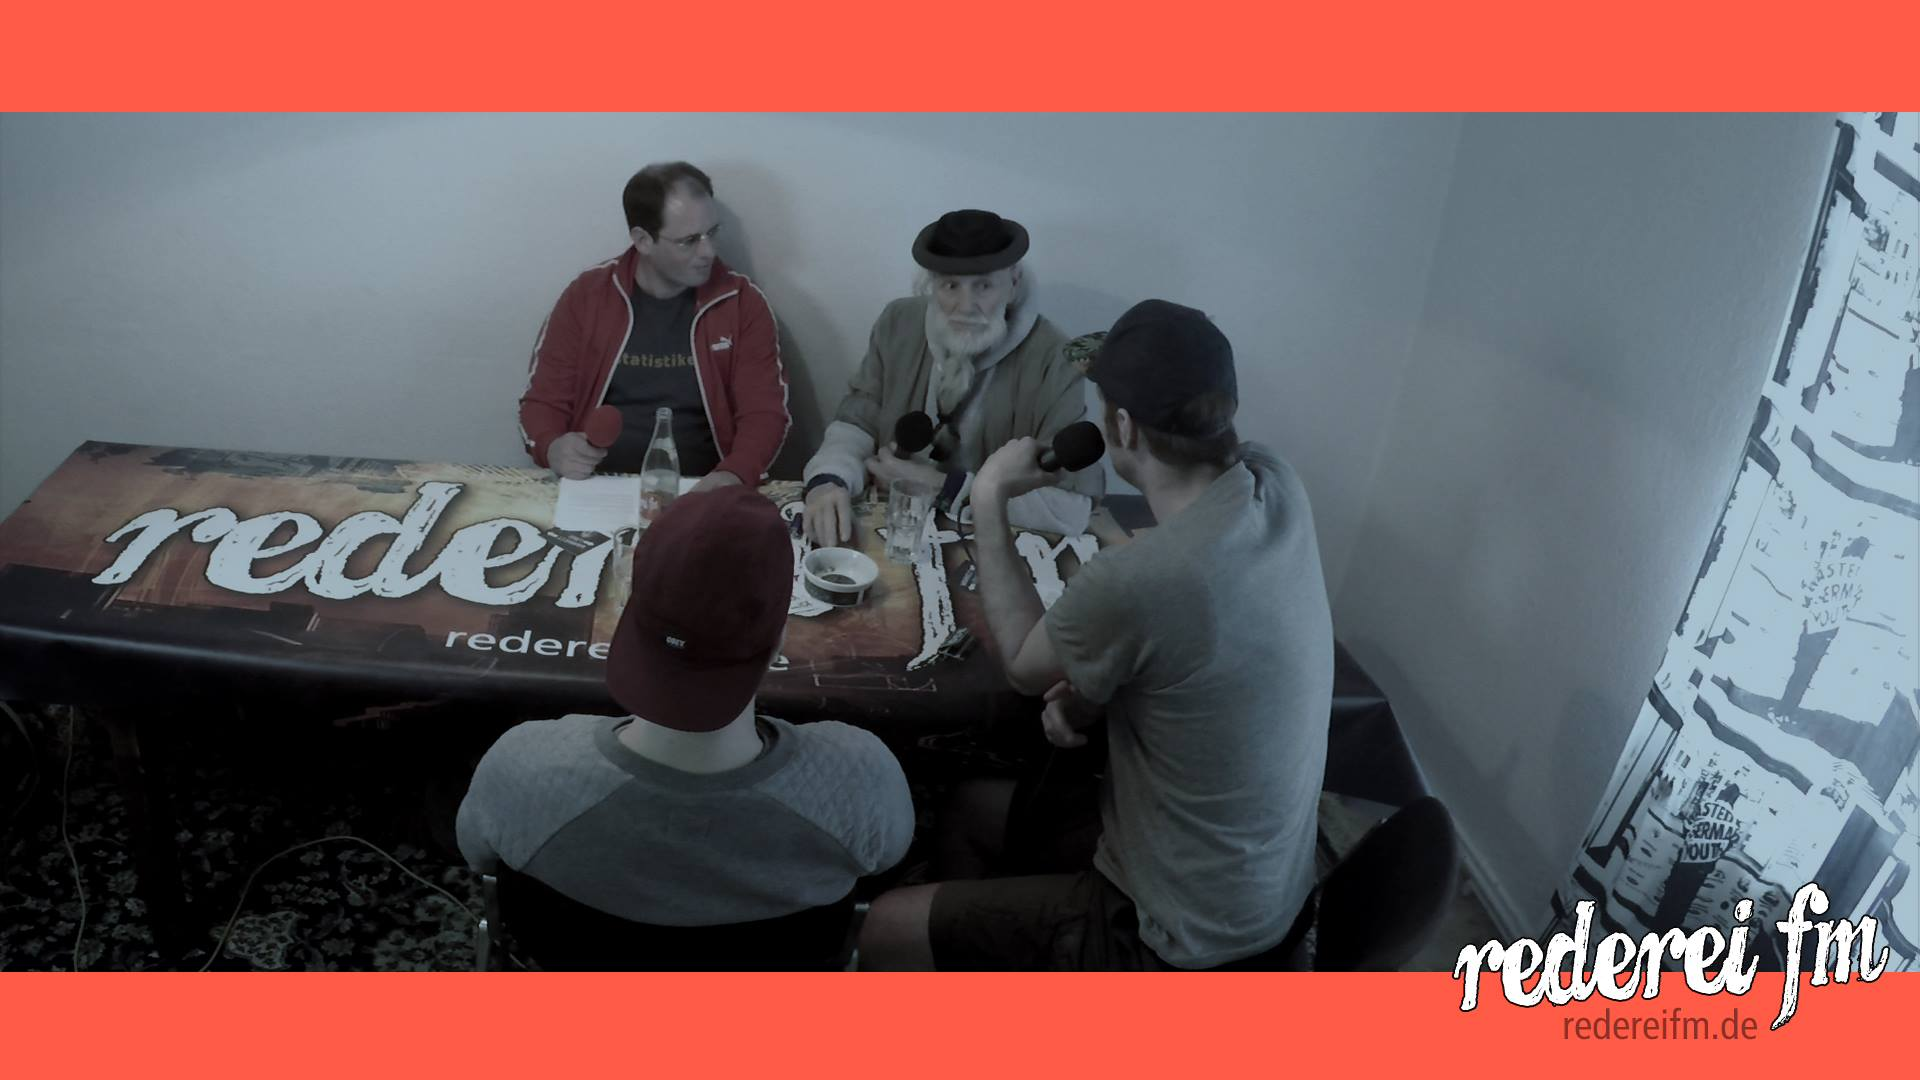 Vera Partei - Komet Bernhard - Felix Herzog - Rederei FM 3